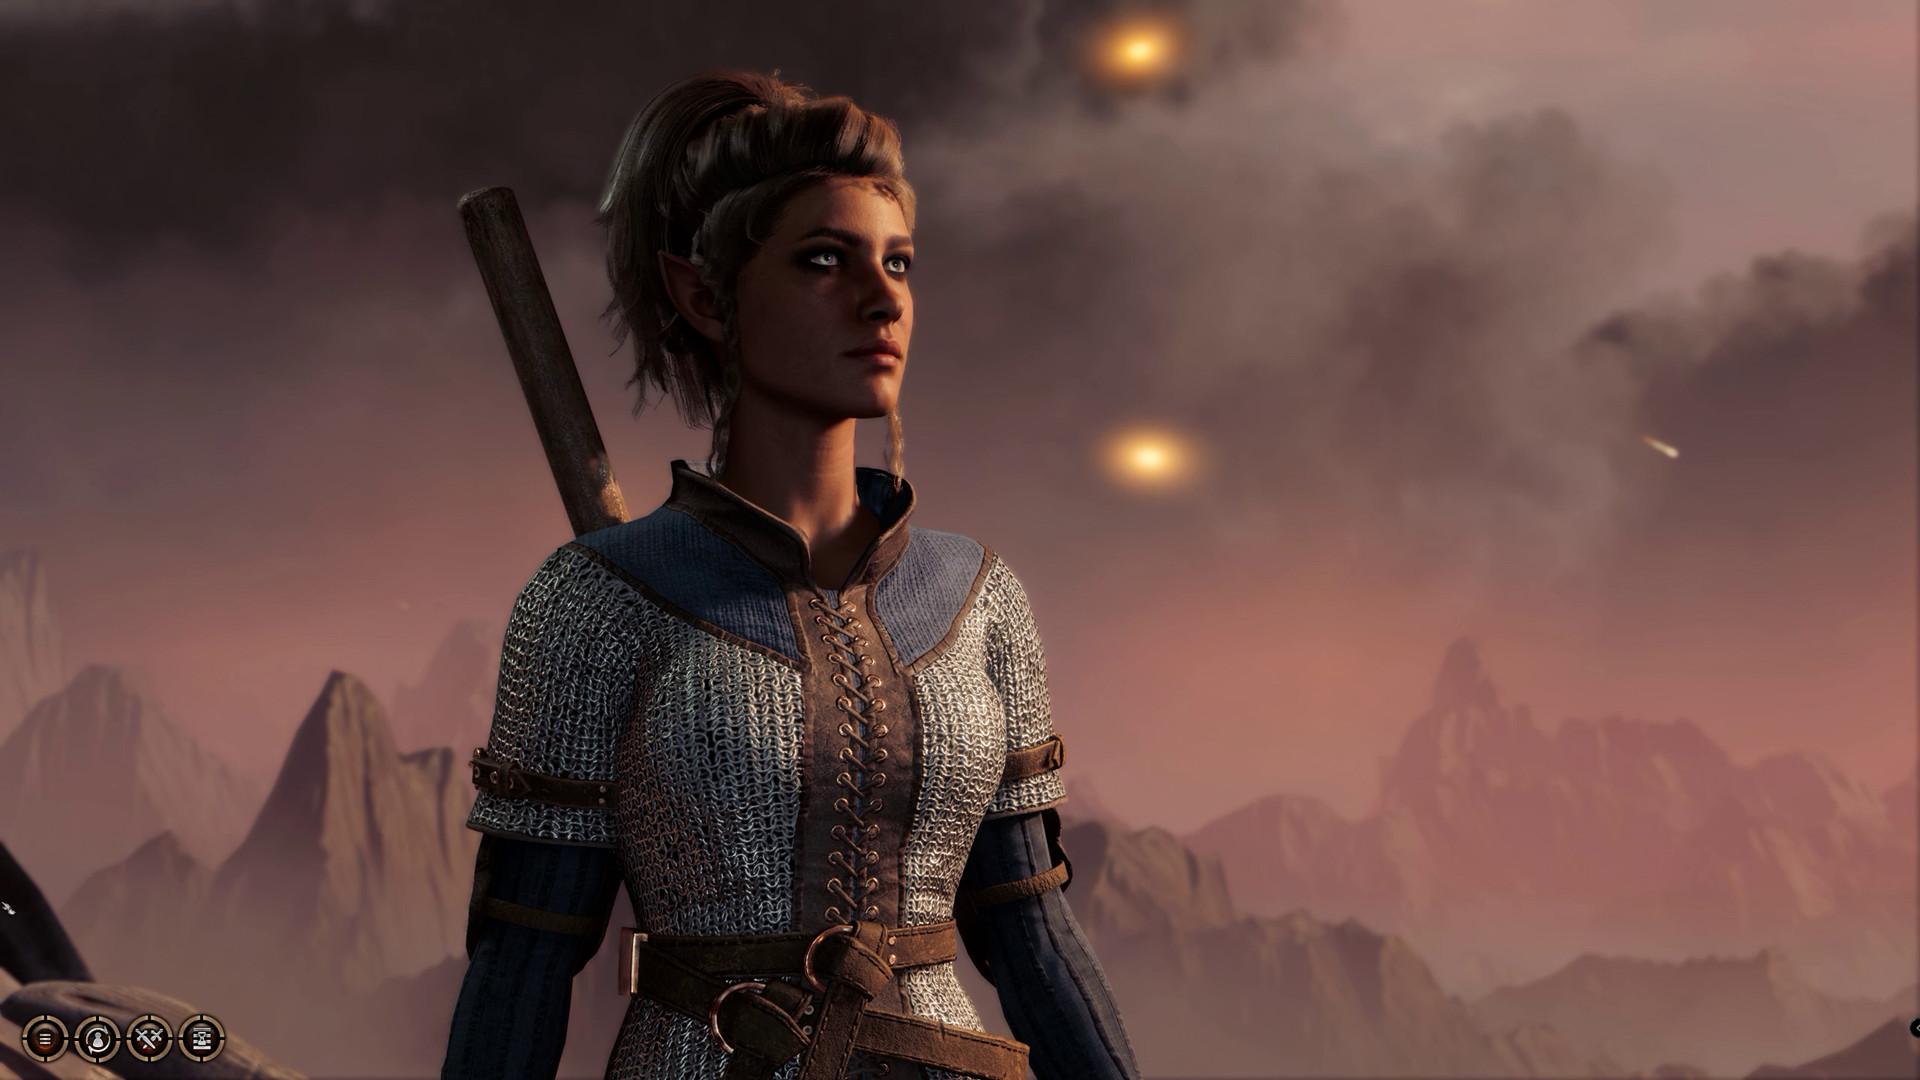 Steam一周销量榜公布 《博德之门3》成功登顶